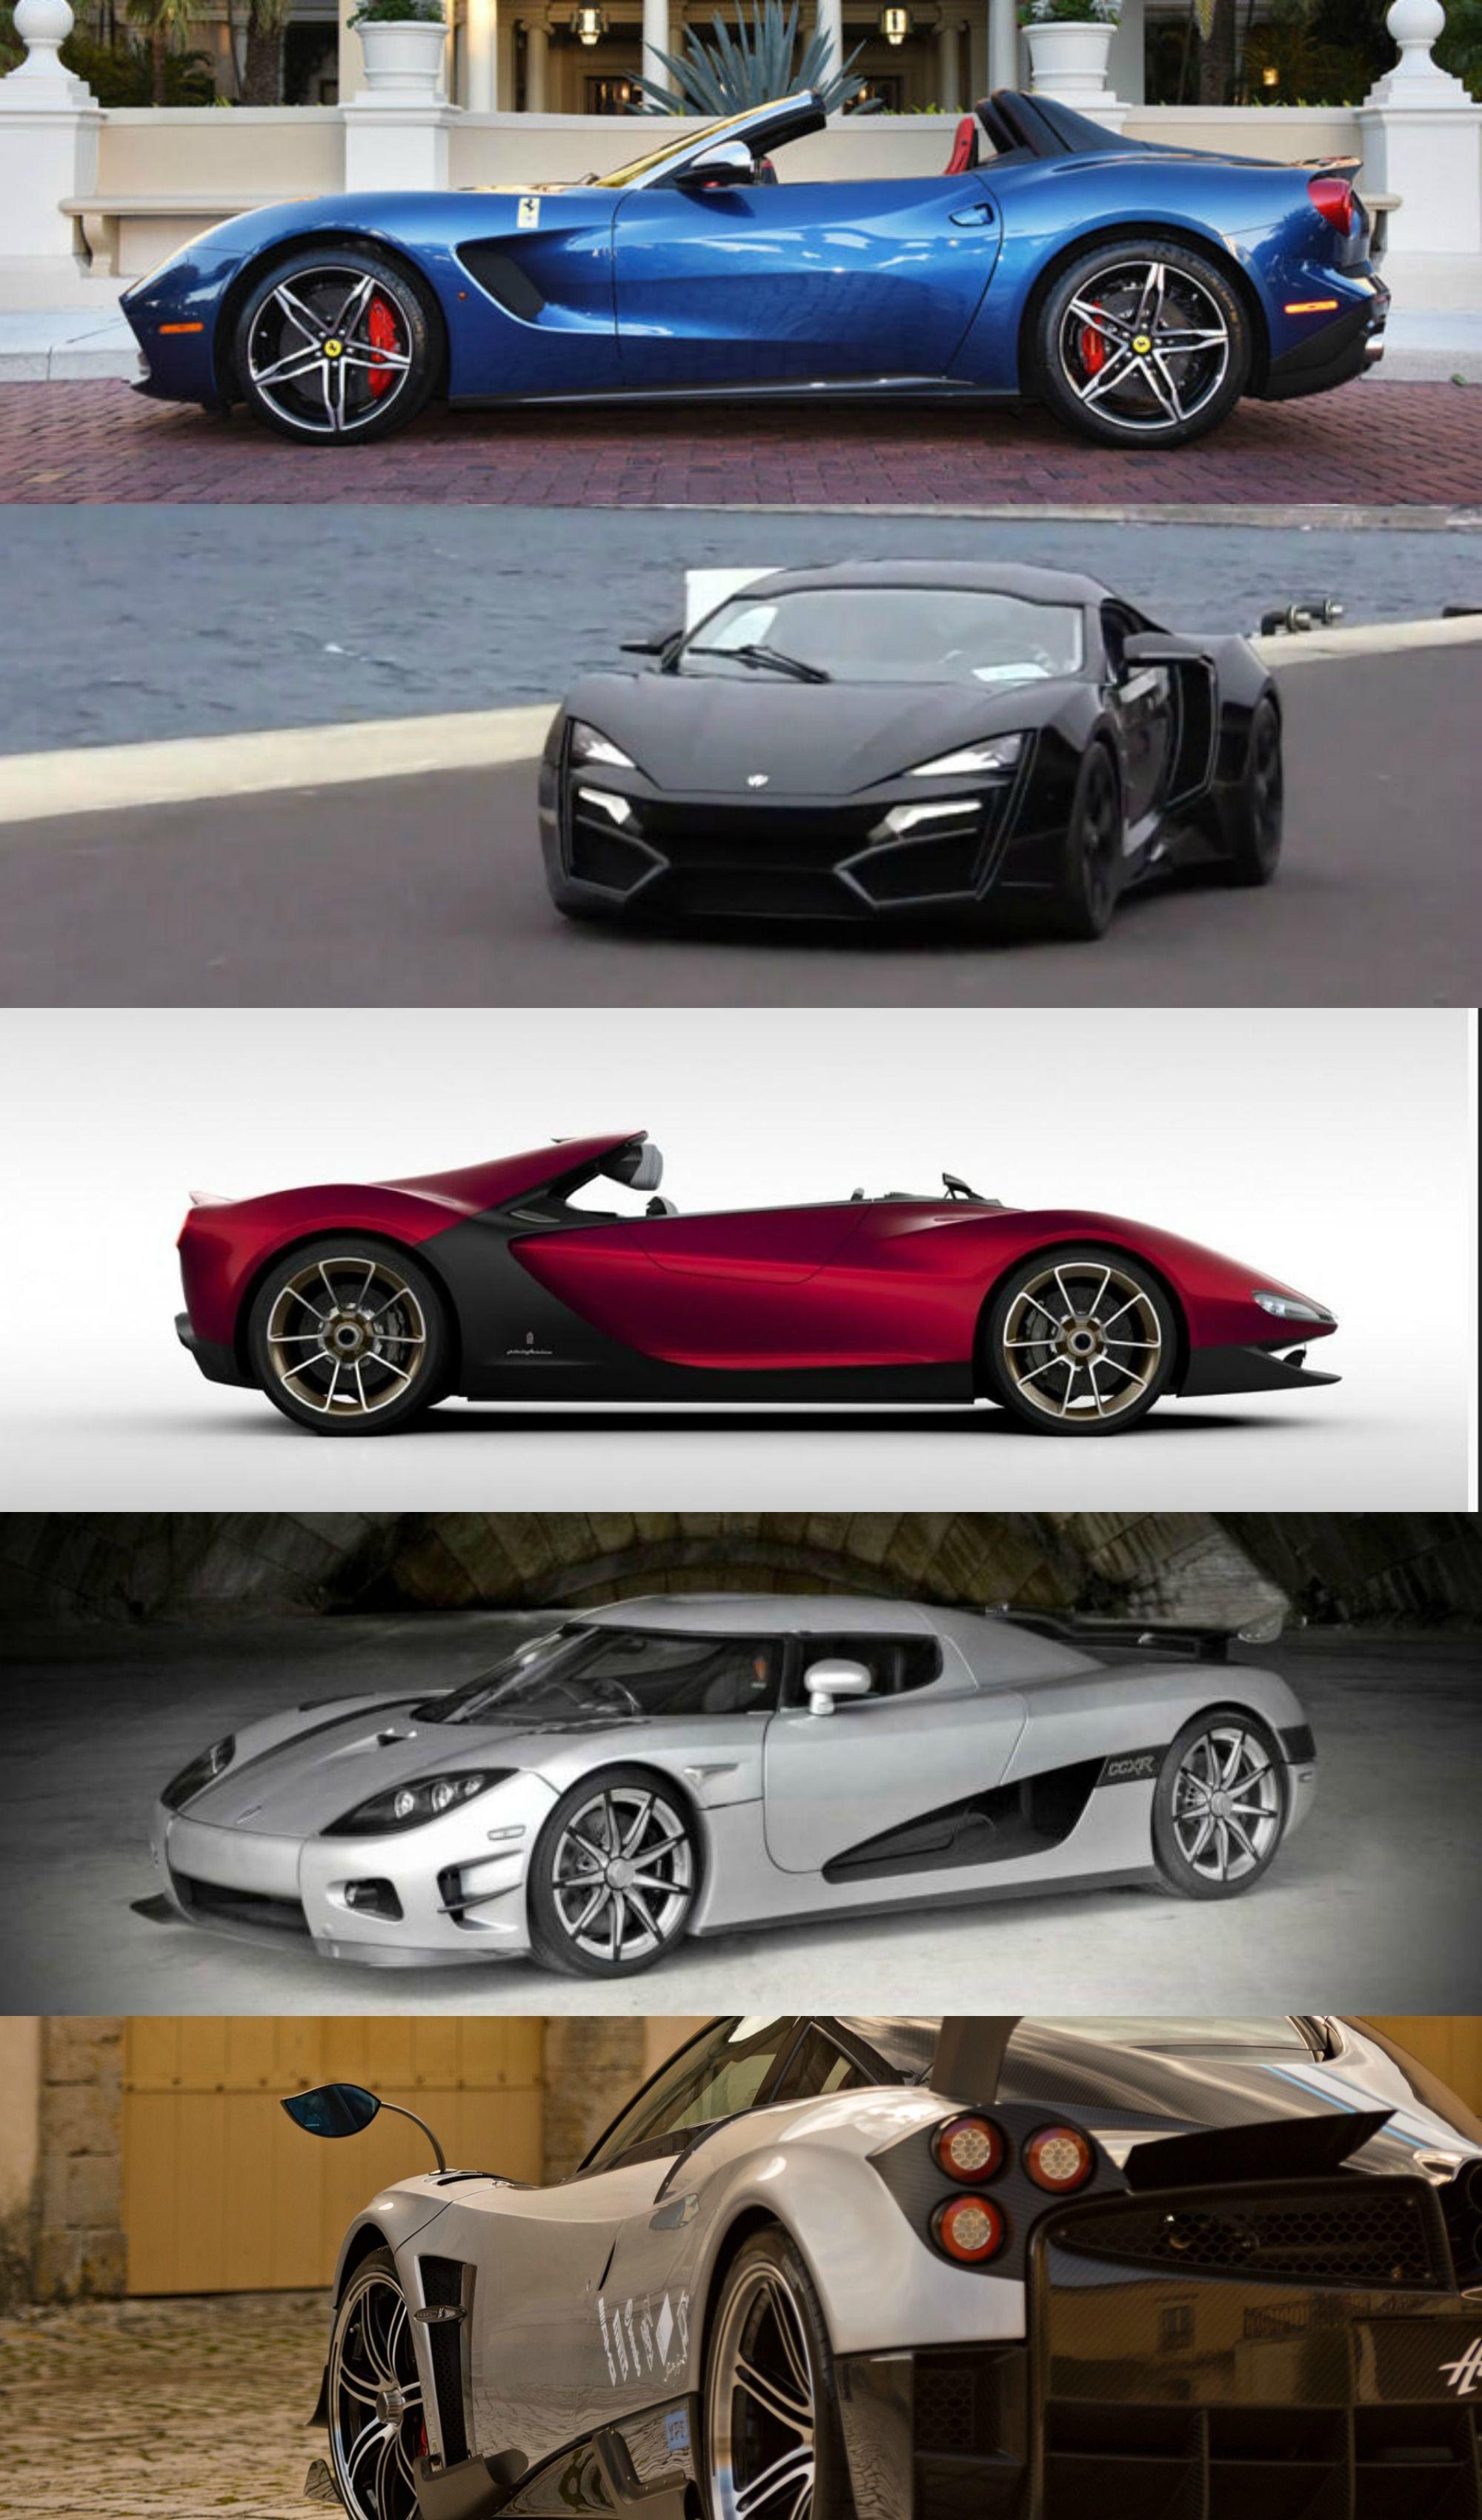 5 Rare Supercars Worth Millions Super Cars Dream Cars Hot Cars